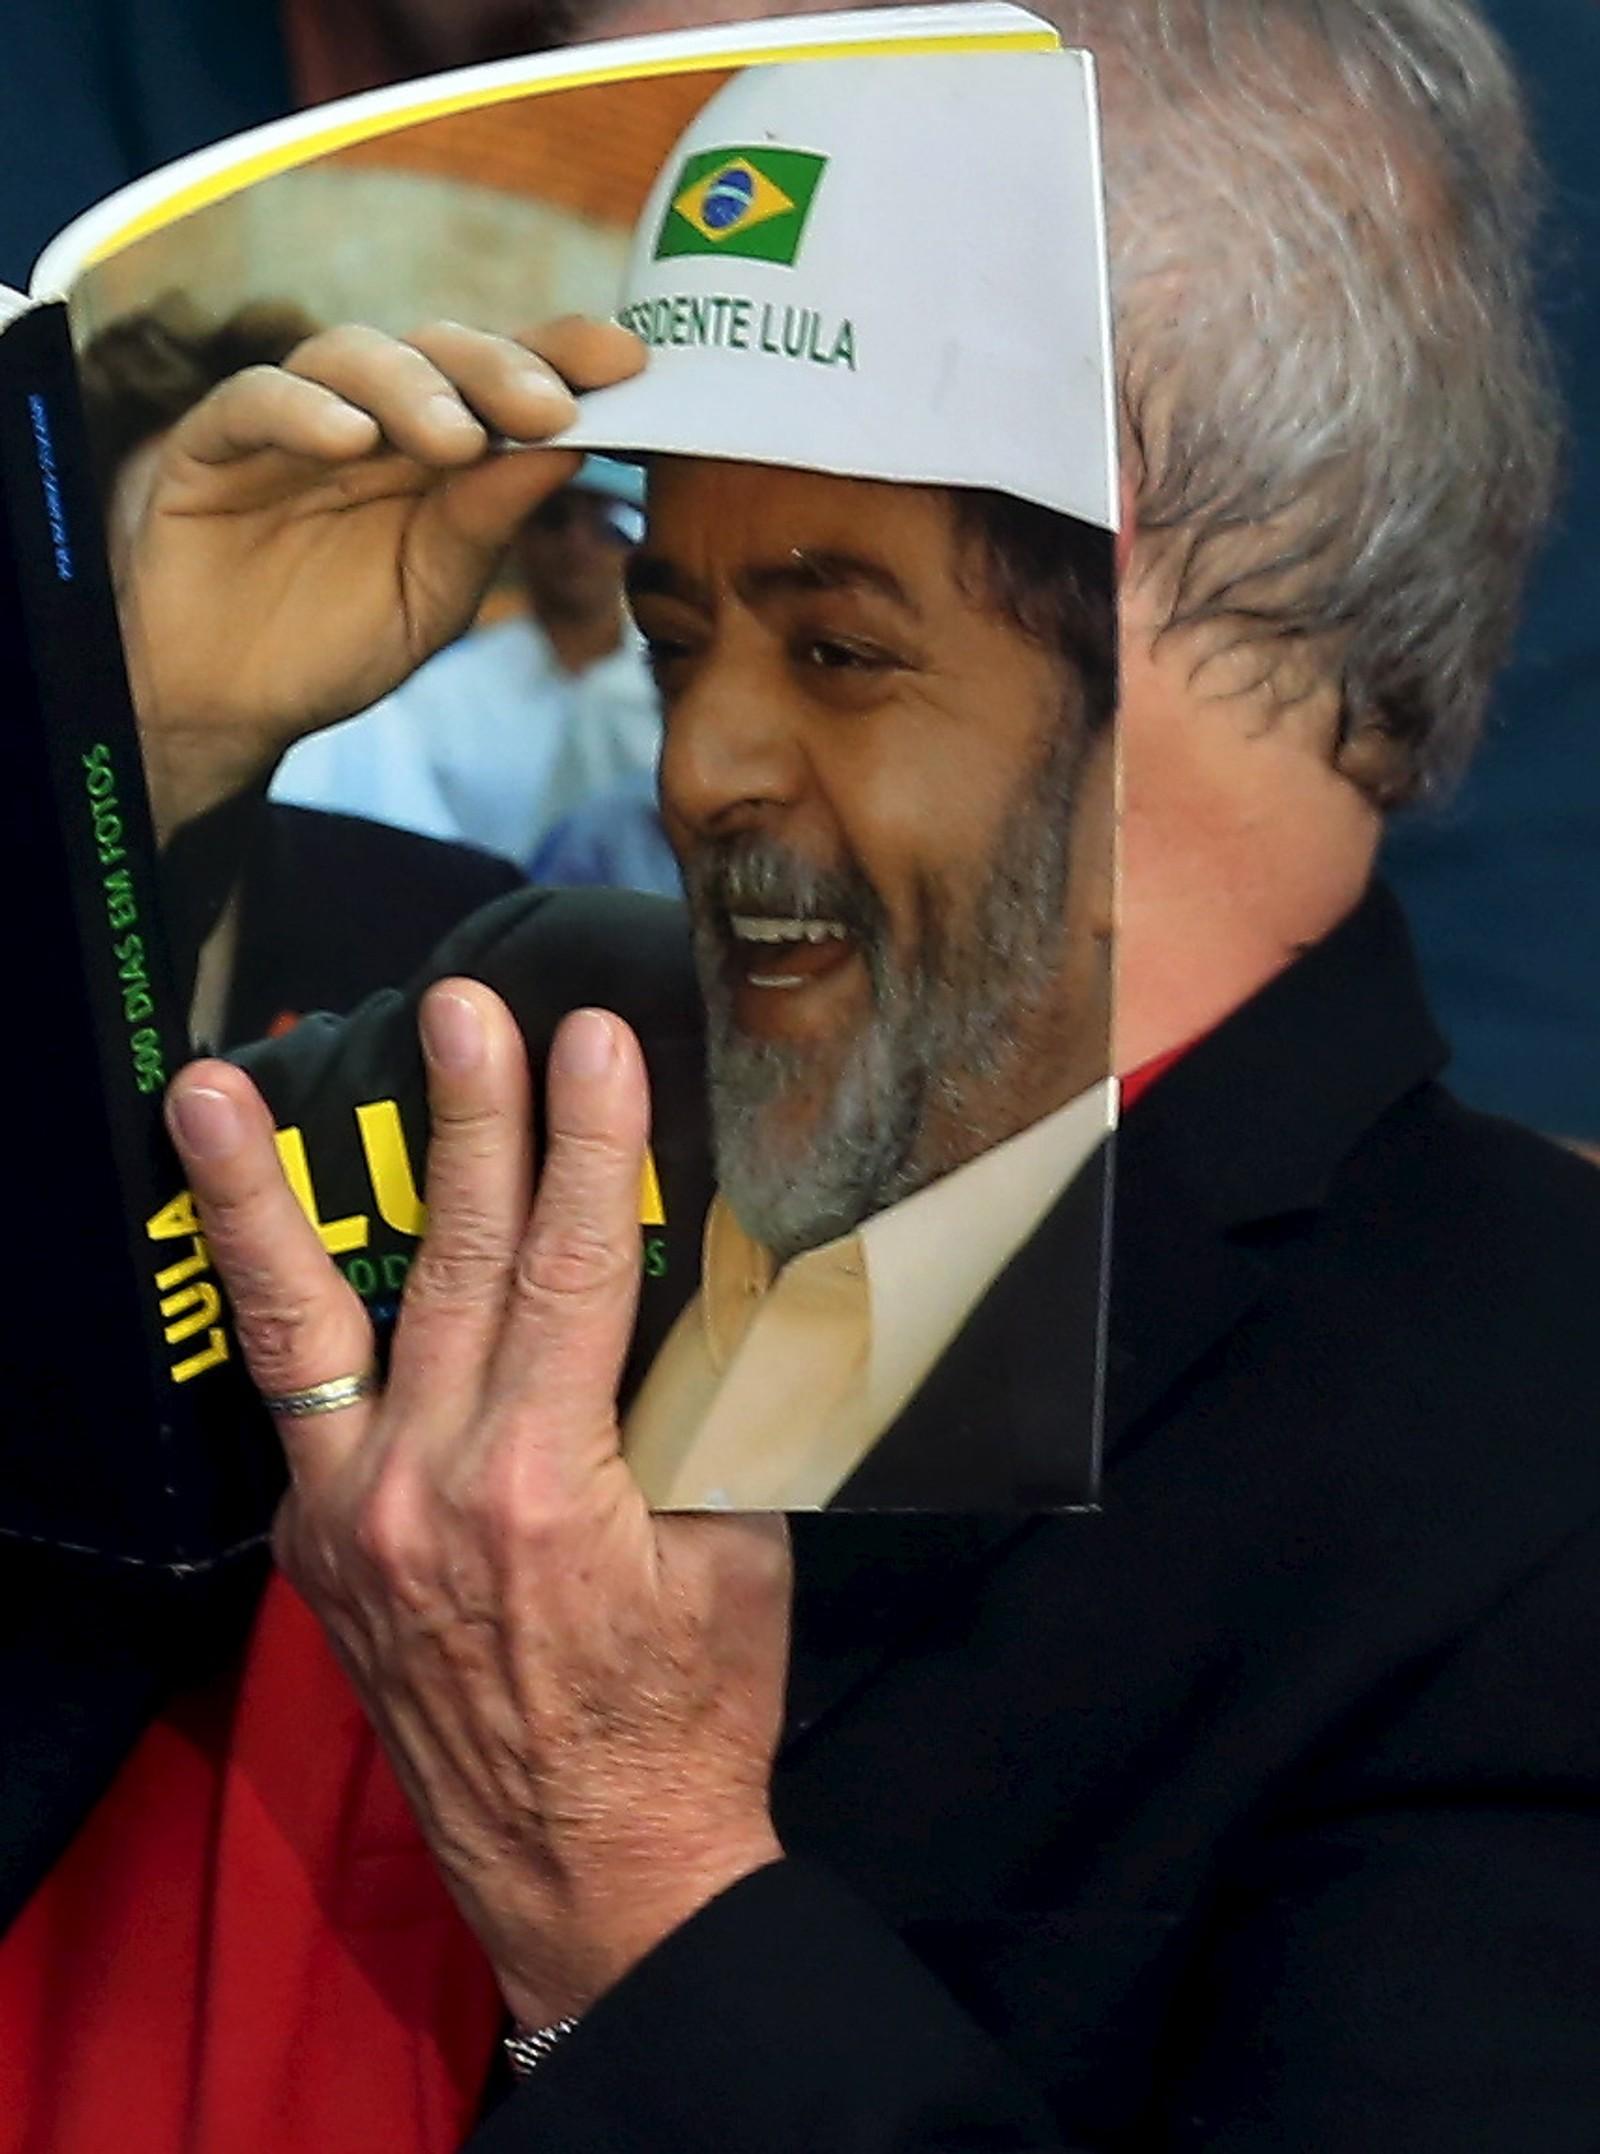 Bookfacefriday er en ukentlig seanse på Instagram. Eks-president Luiz Inacio Lula da Silva bidrar her med sin versjon.